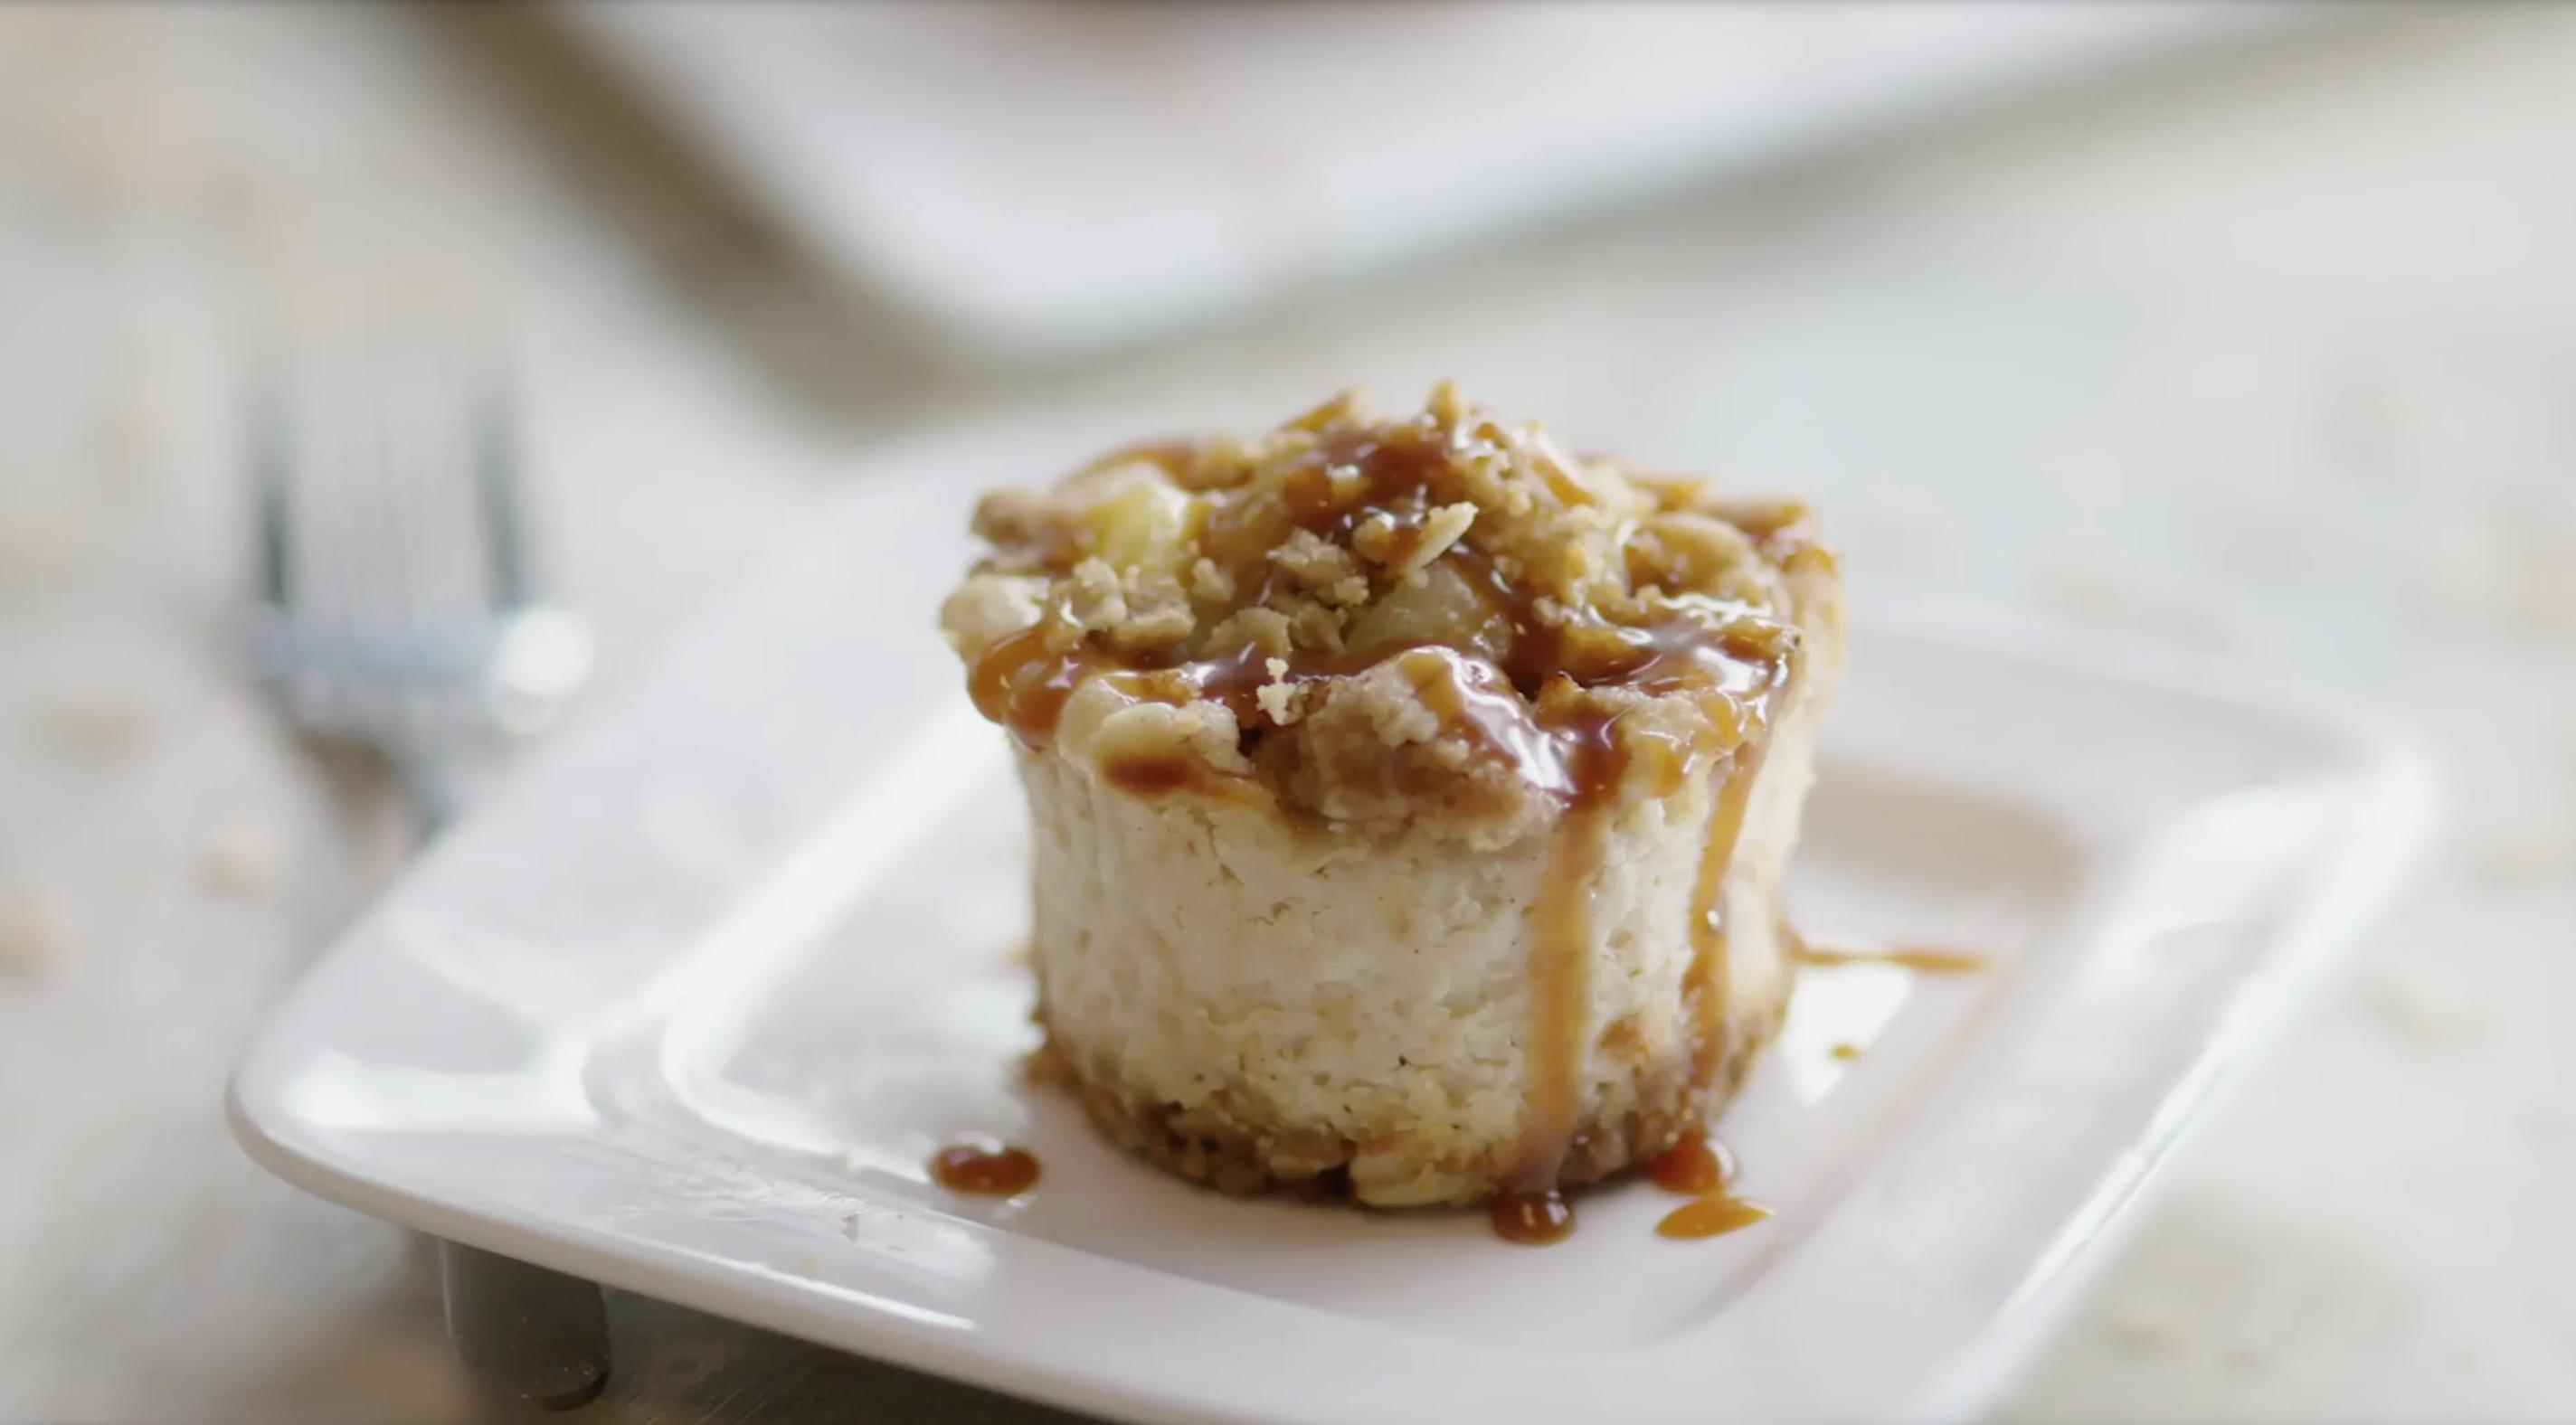 Best Bites: Caramel apple crisp mini cheesecakes